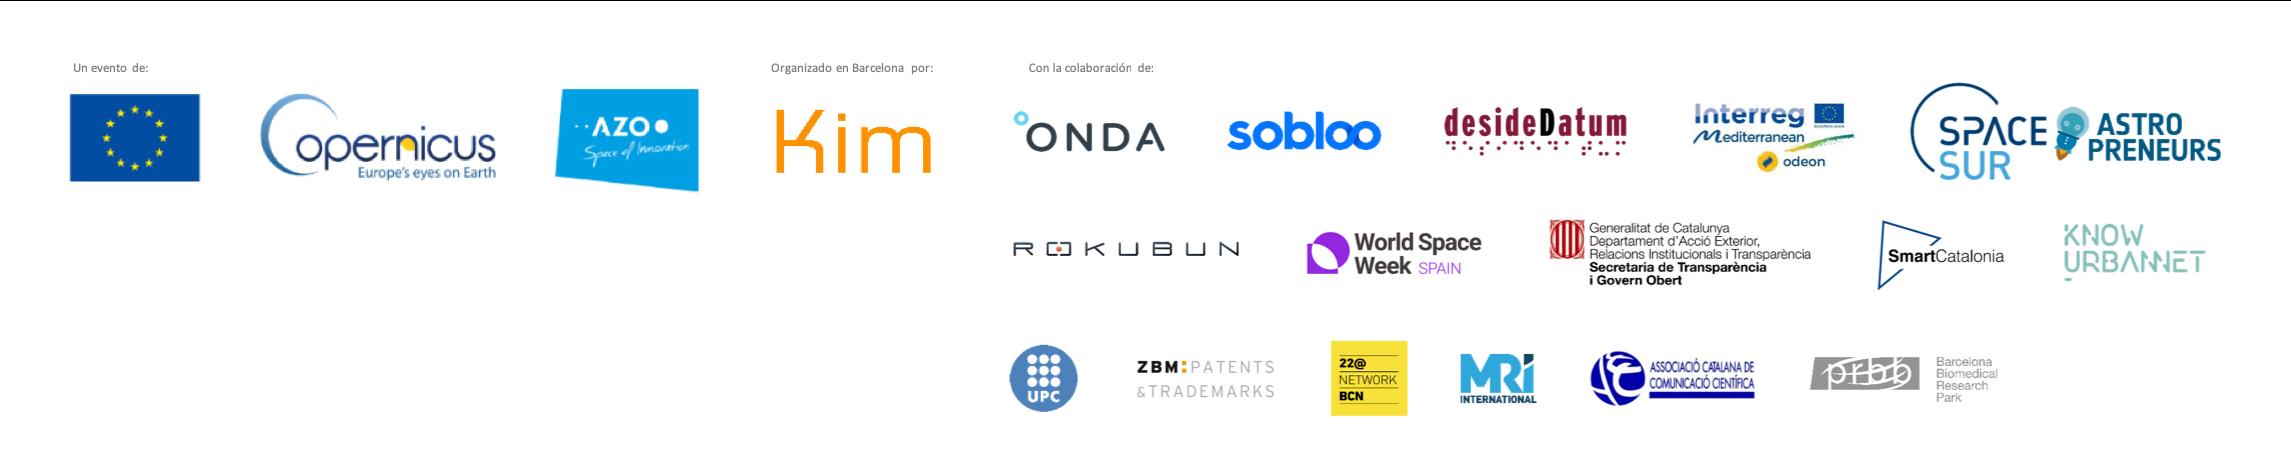 Copernicus Hackathon Barcelona 2019